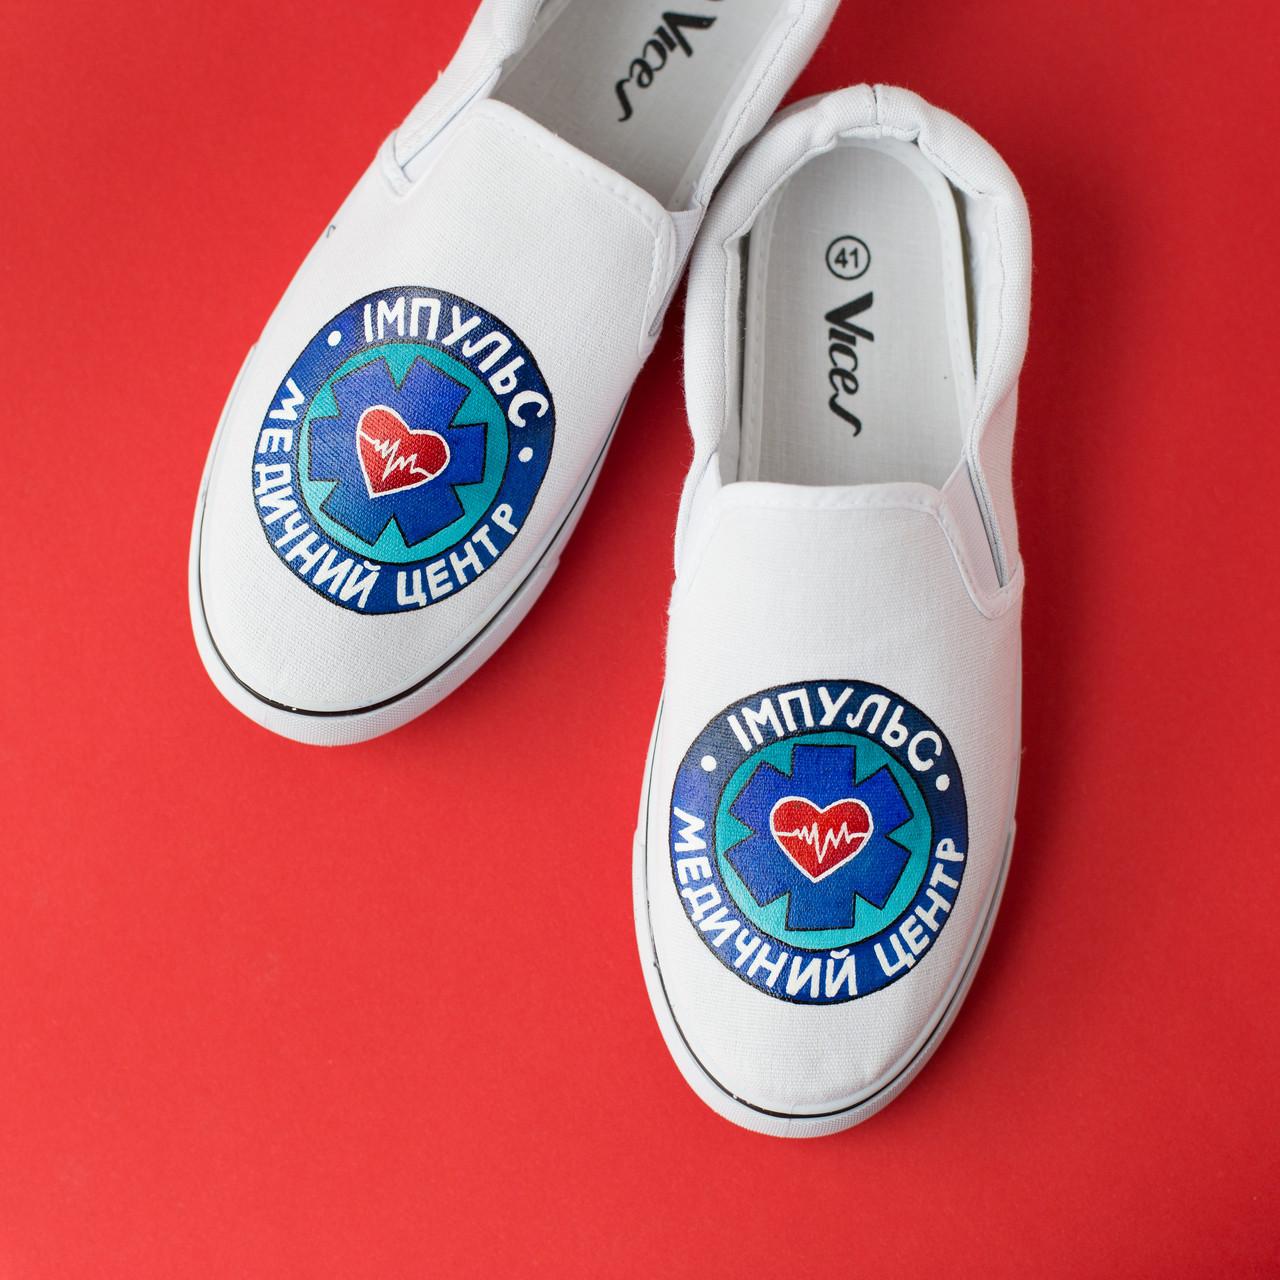 Медична взуття з дизайнерським принтом ручної роботи